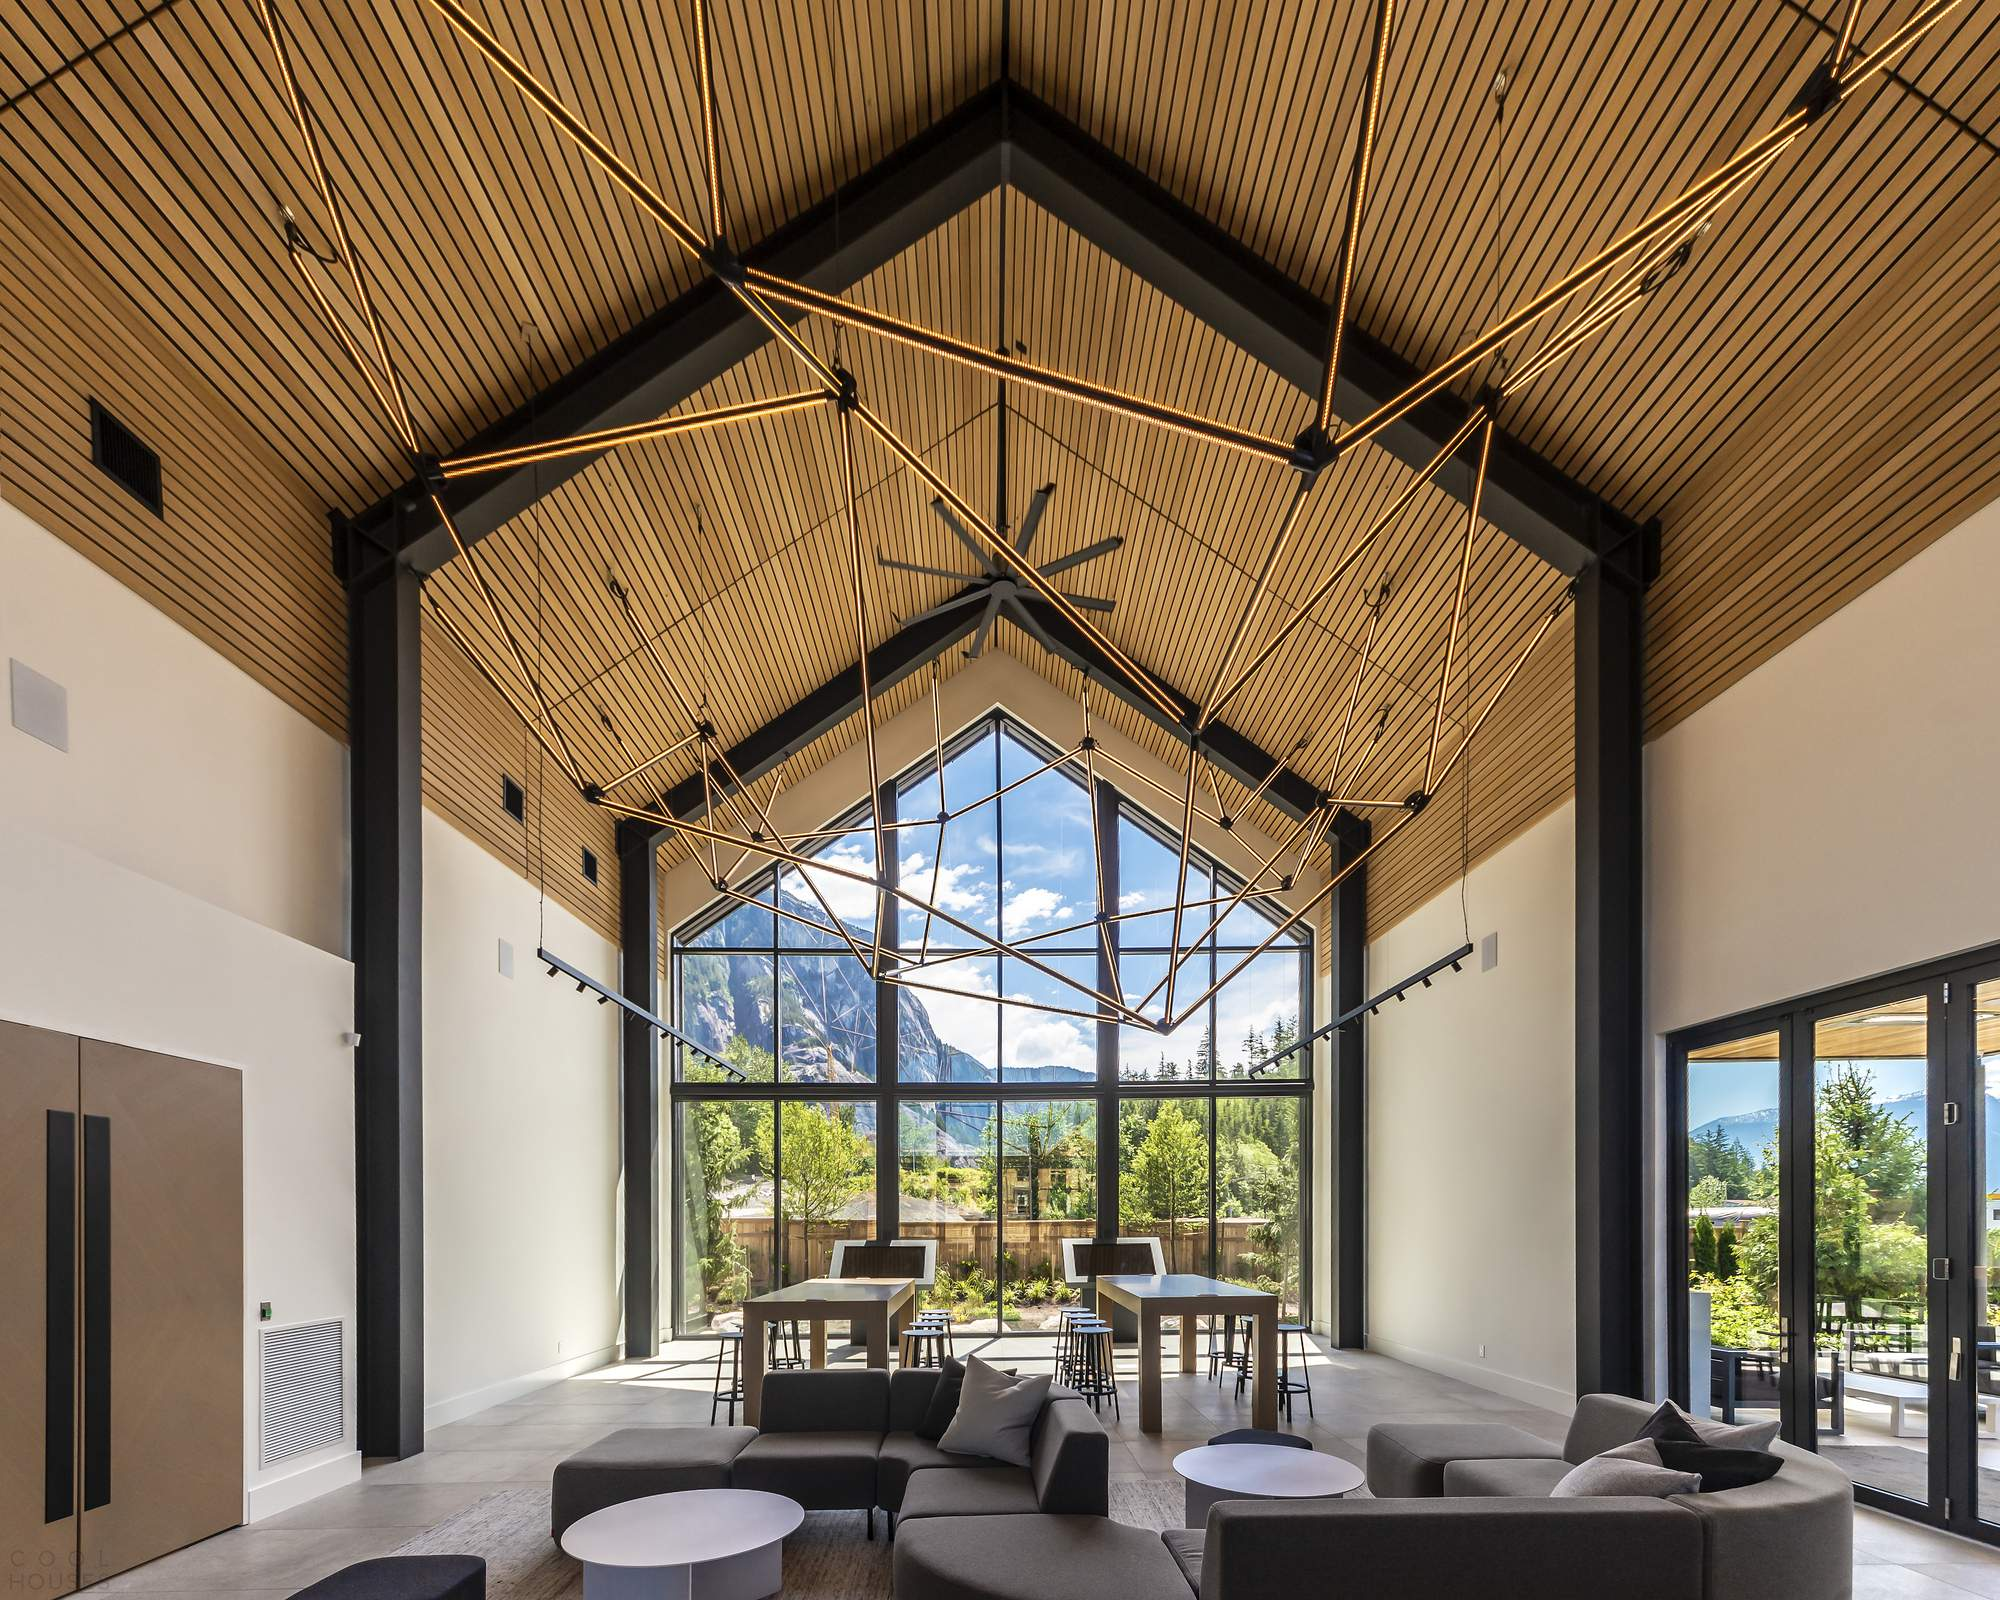 Центр открытий «Море и небо» с впечатляющим дизайном, Канада